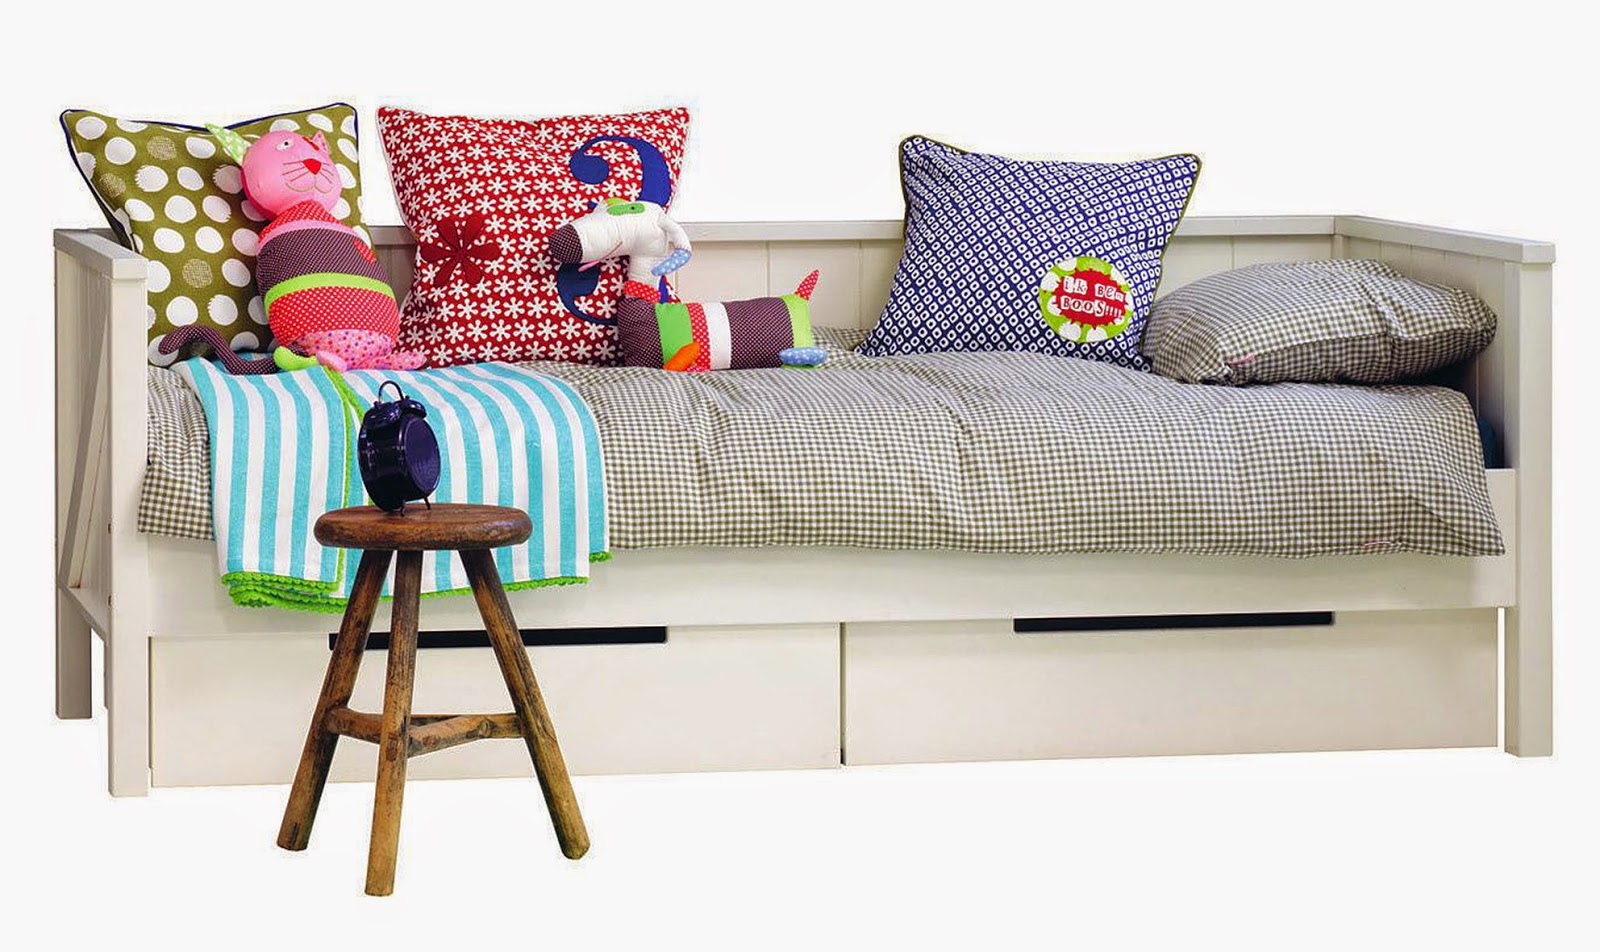 http://www.portobellostreet.es/mueble/40572/Cama-nido-con-cajones-blanca-Brace